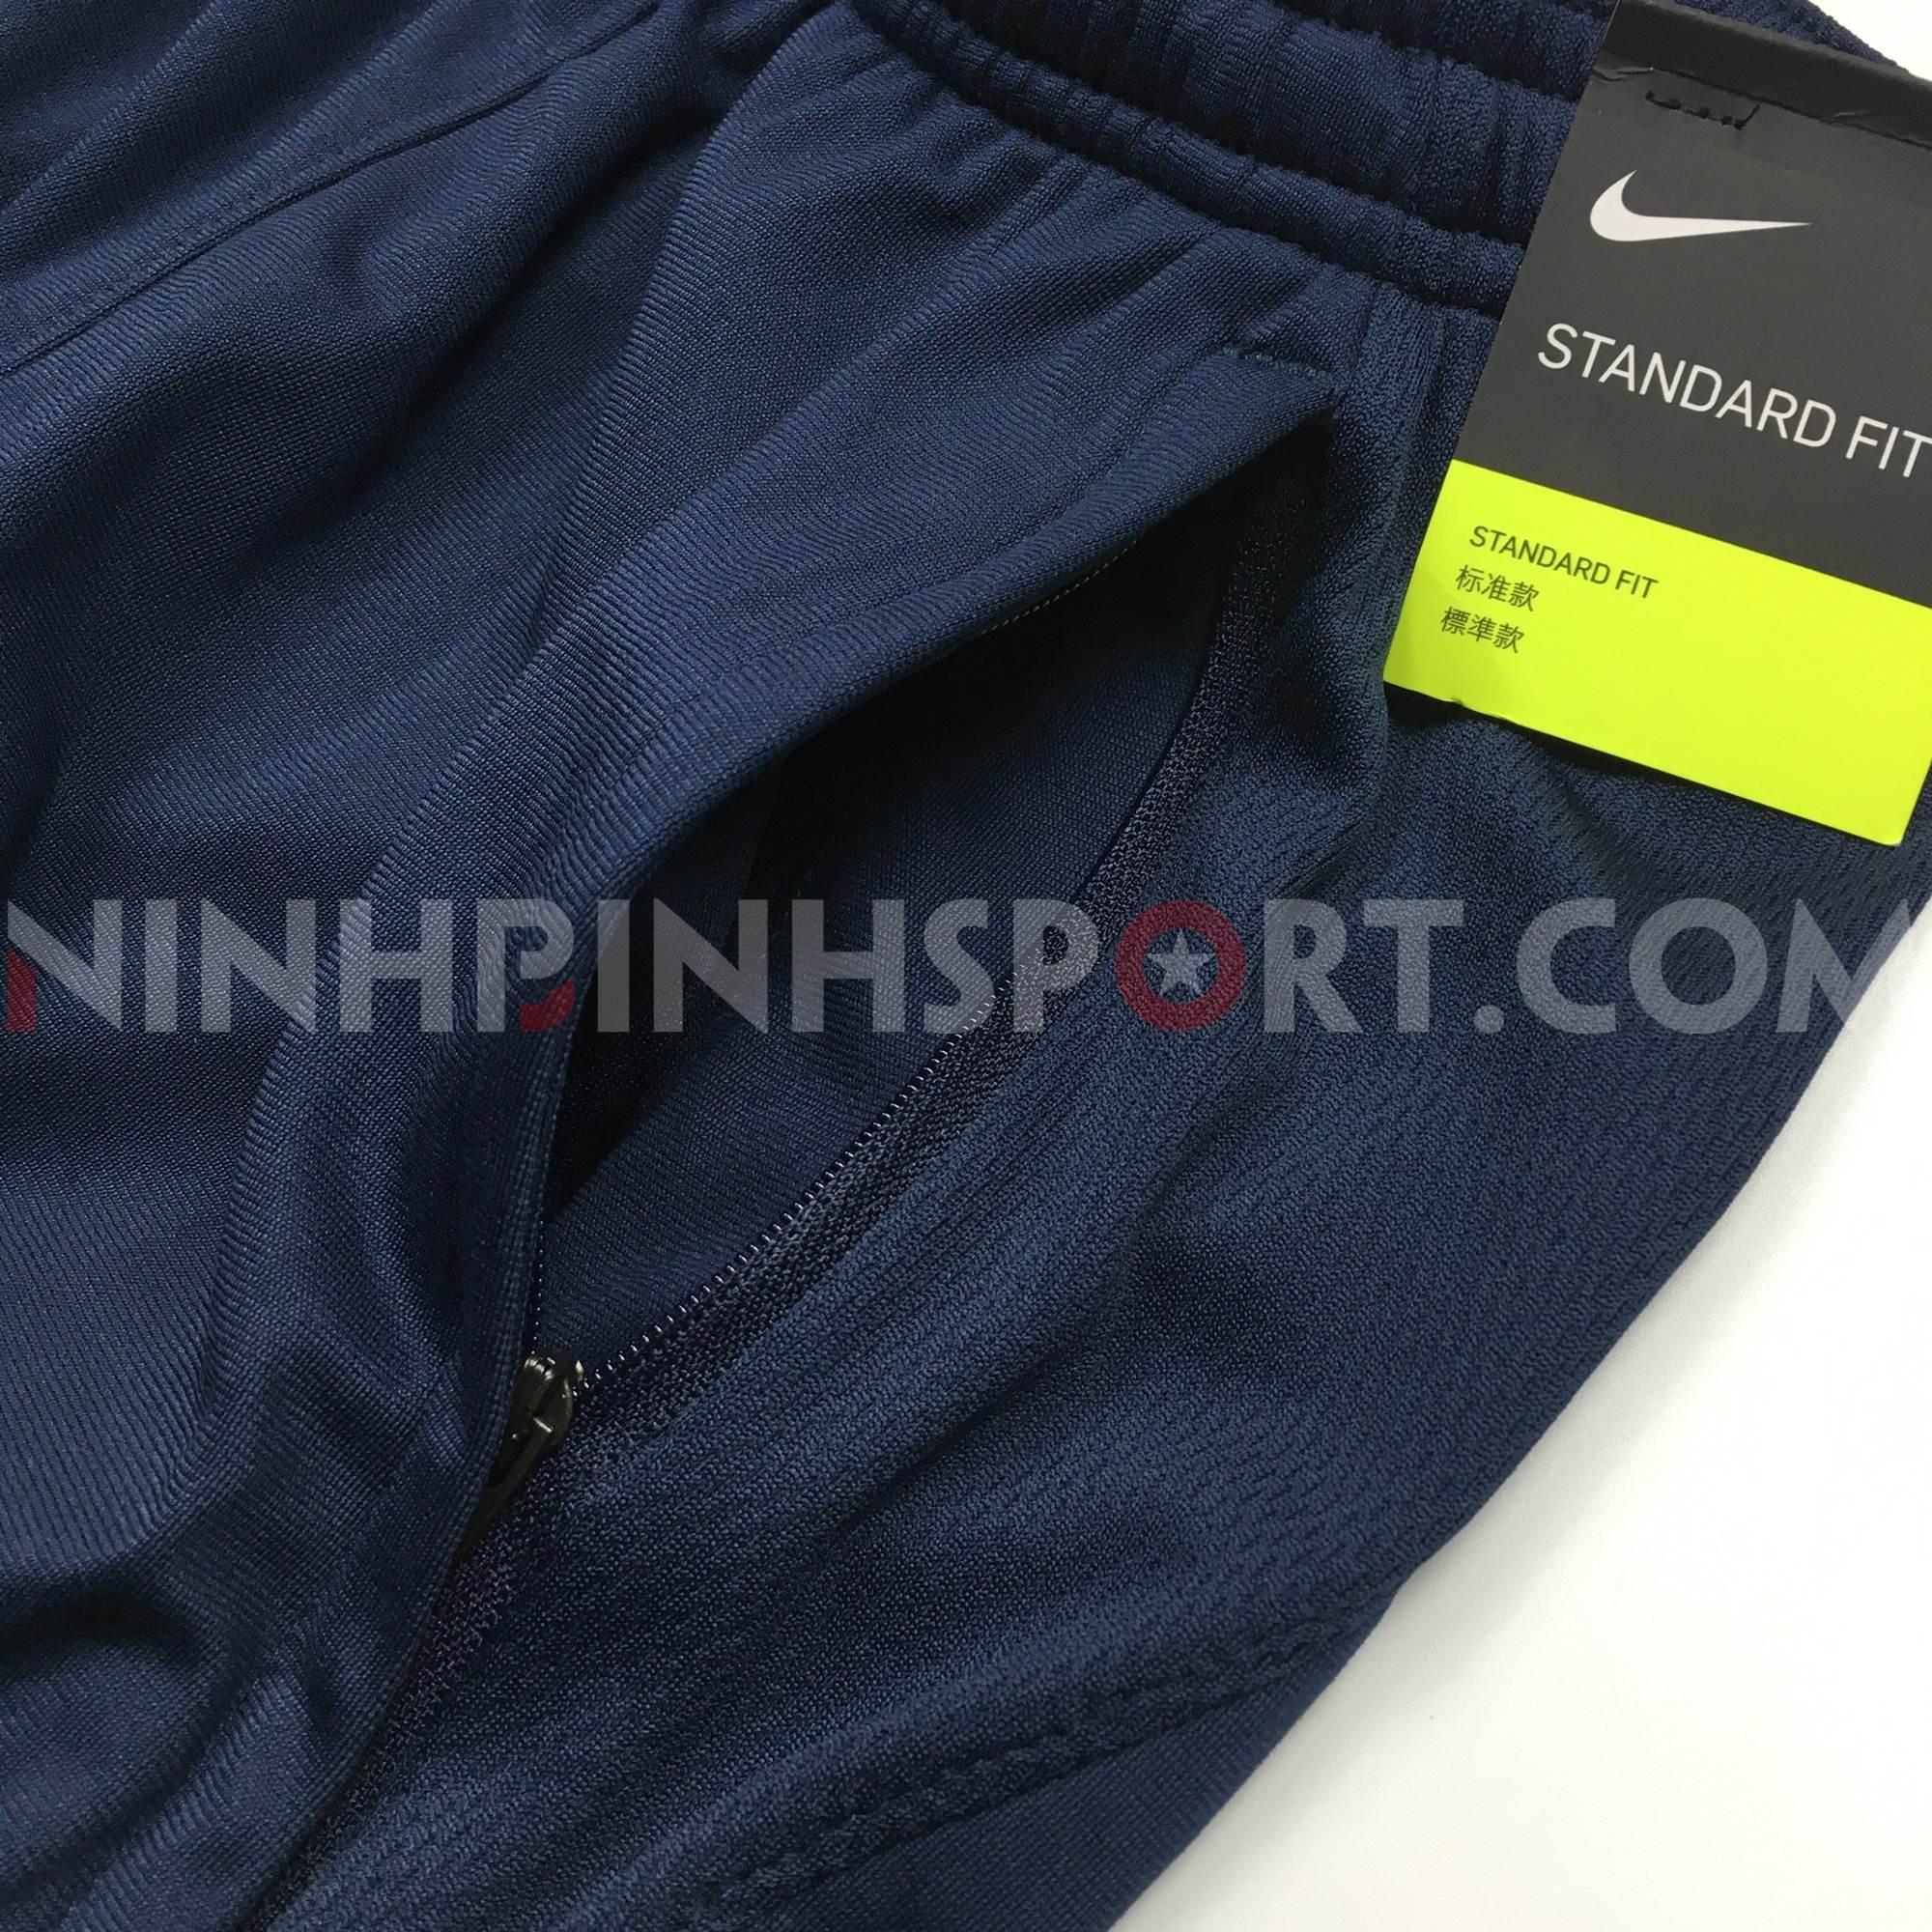 Quần thể thao nam Nike ACD M18 KZFP Conavy CD2232-451